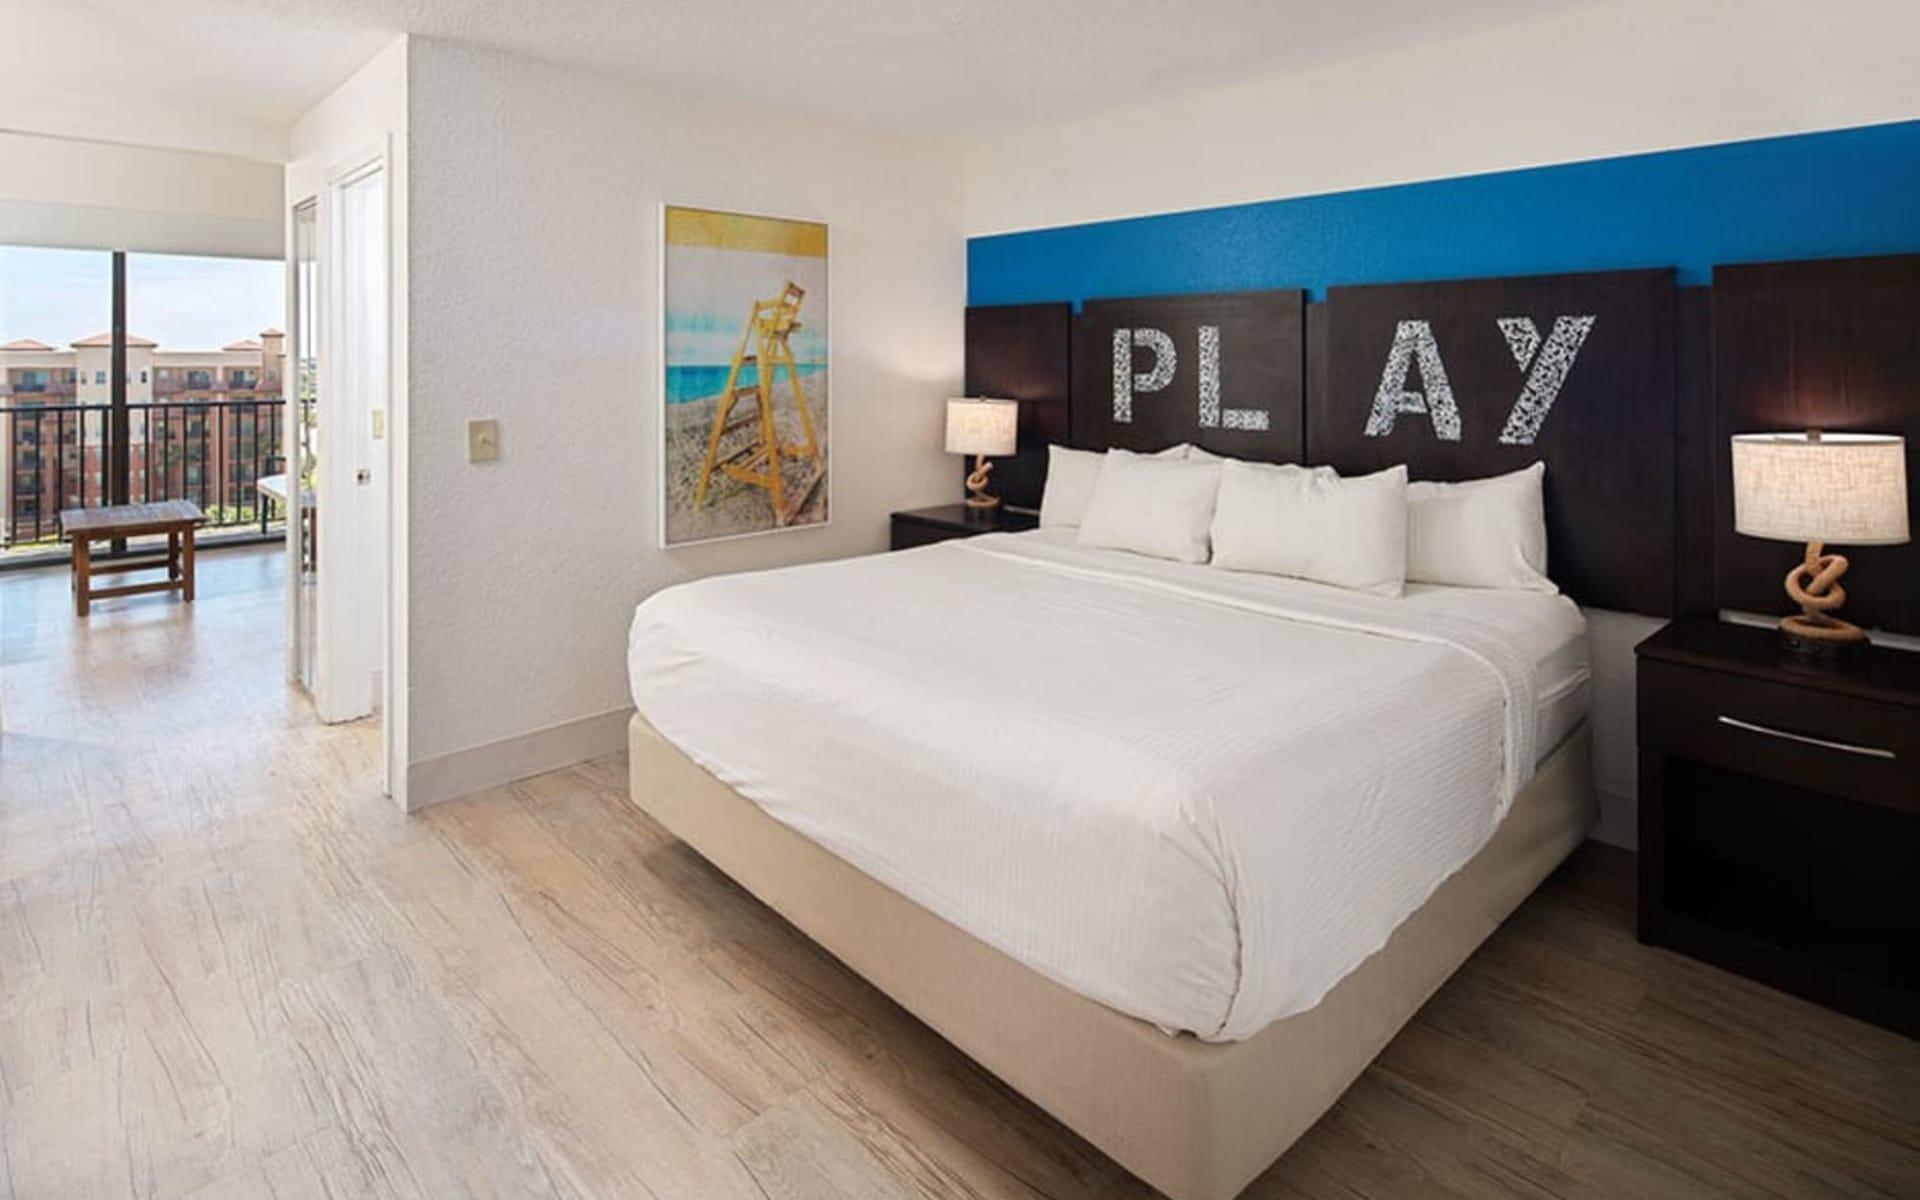 Sirata Beach Resort & Conference Center in St. Pete Beach:  Zimmer_Sirata Beach Resort_Standard_ATI